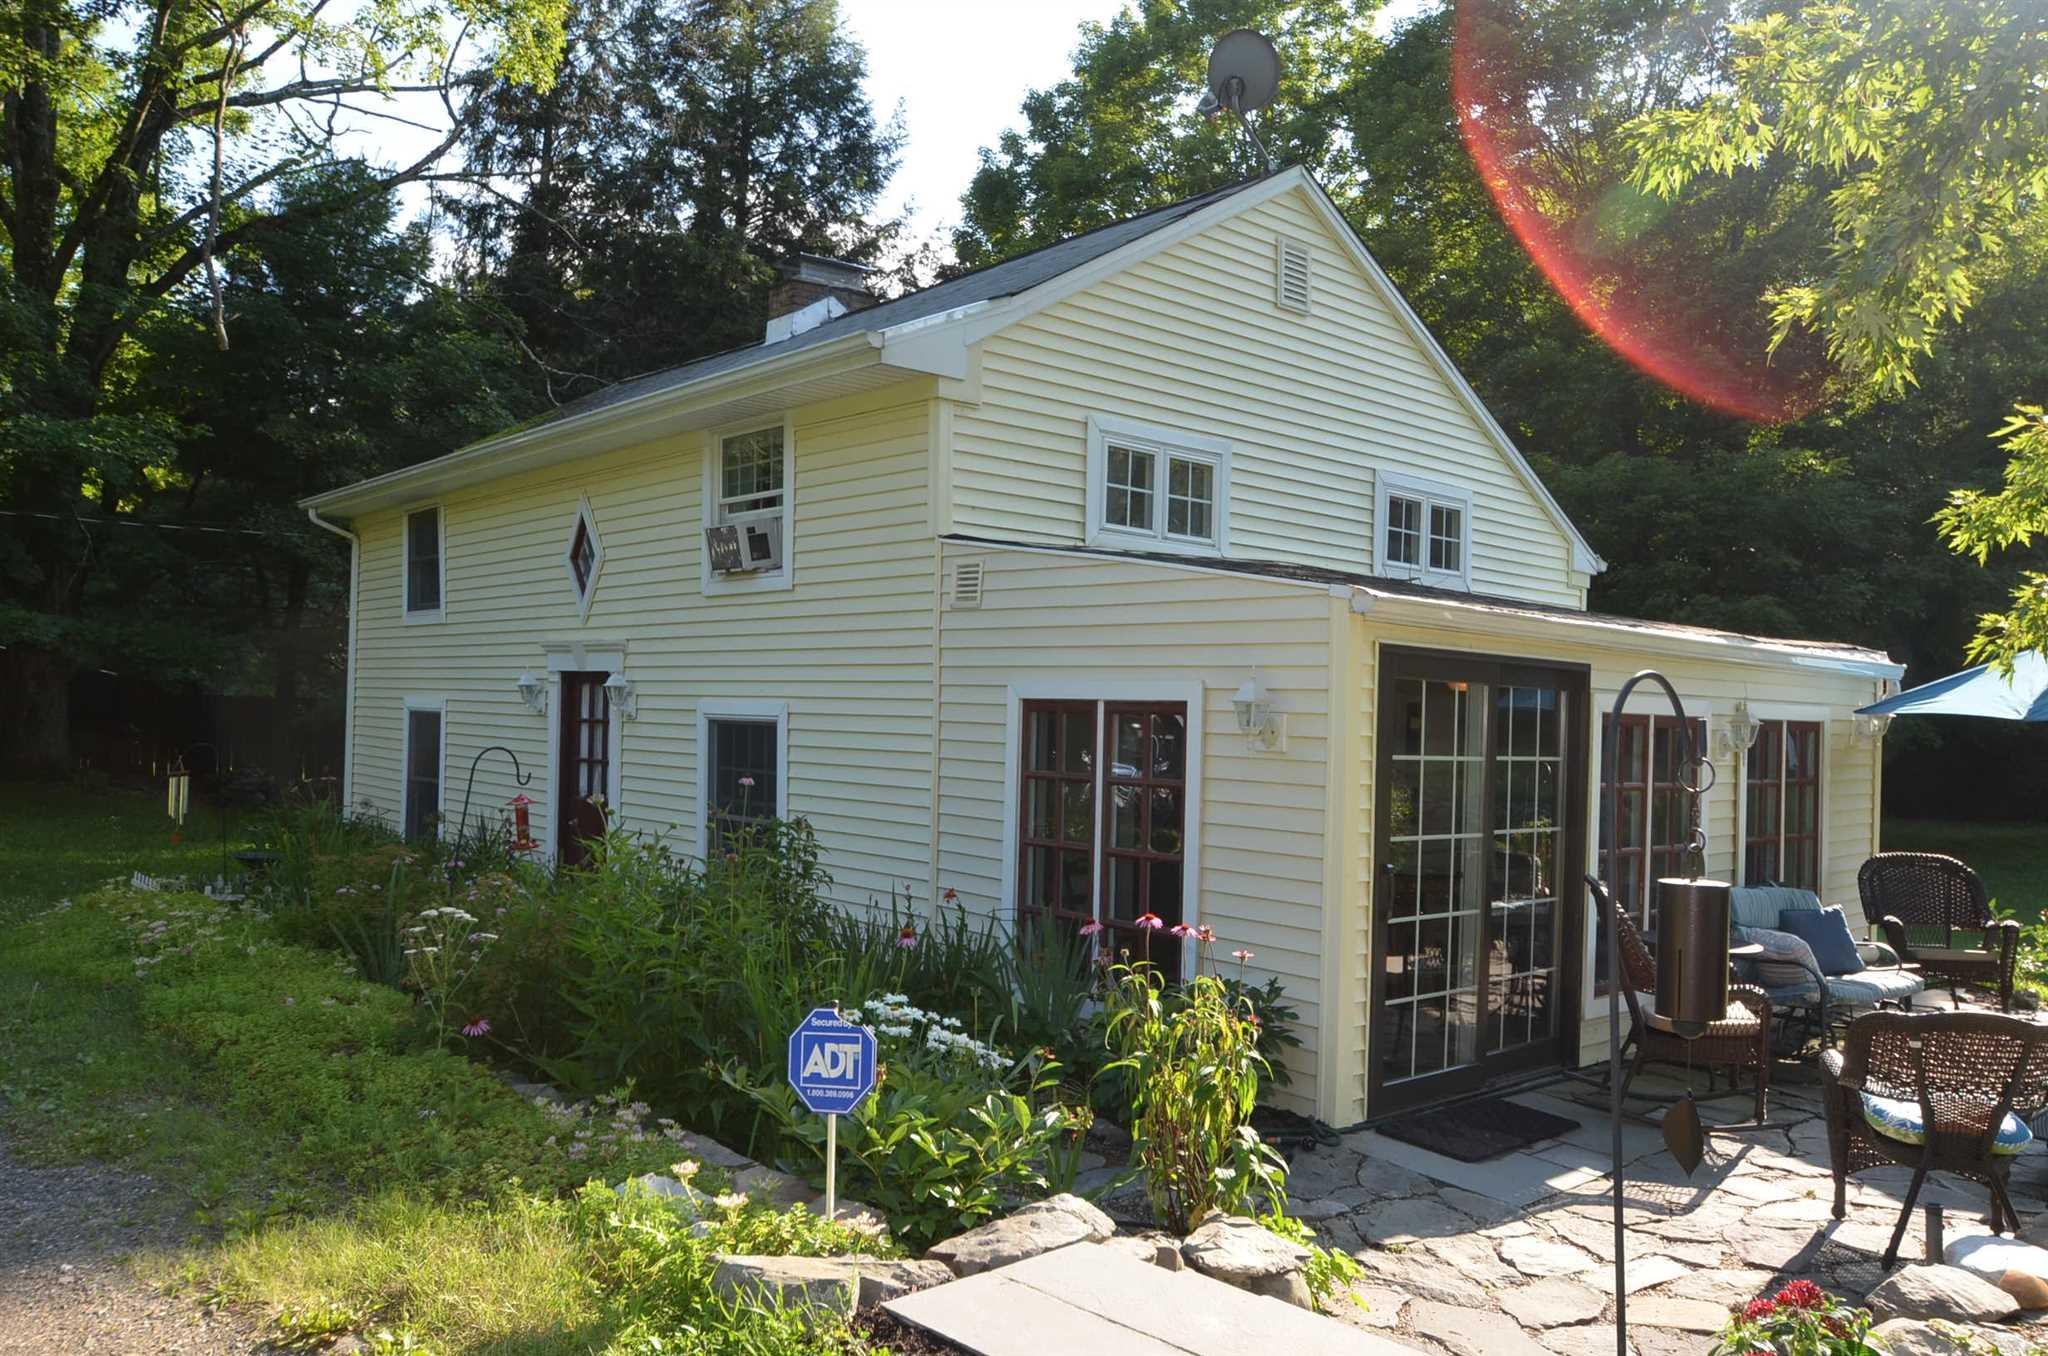 Single Family Home for Sale at 965 QUAKER Lane 965 QUAKER Lane Hyde Park, New York 12580 United States